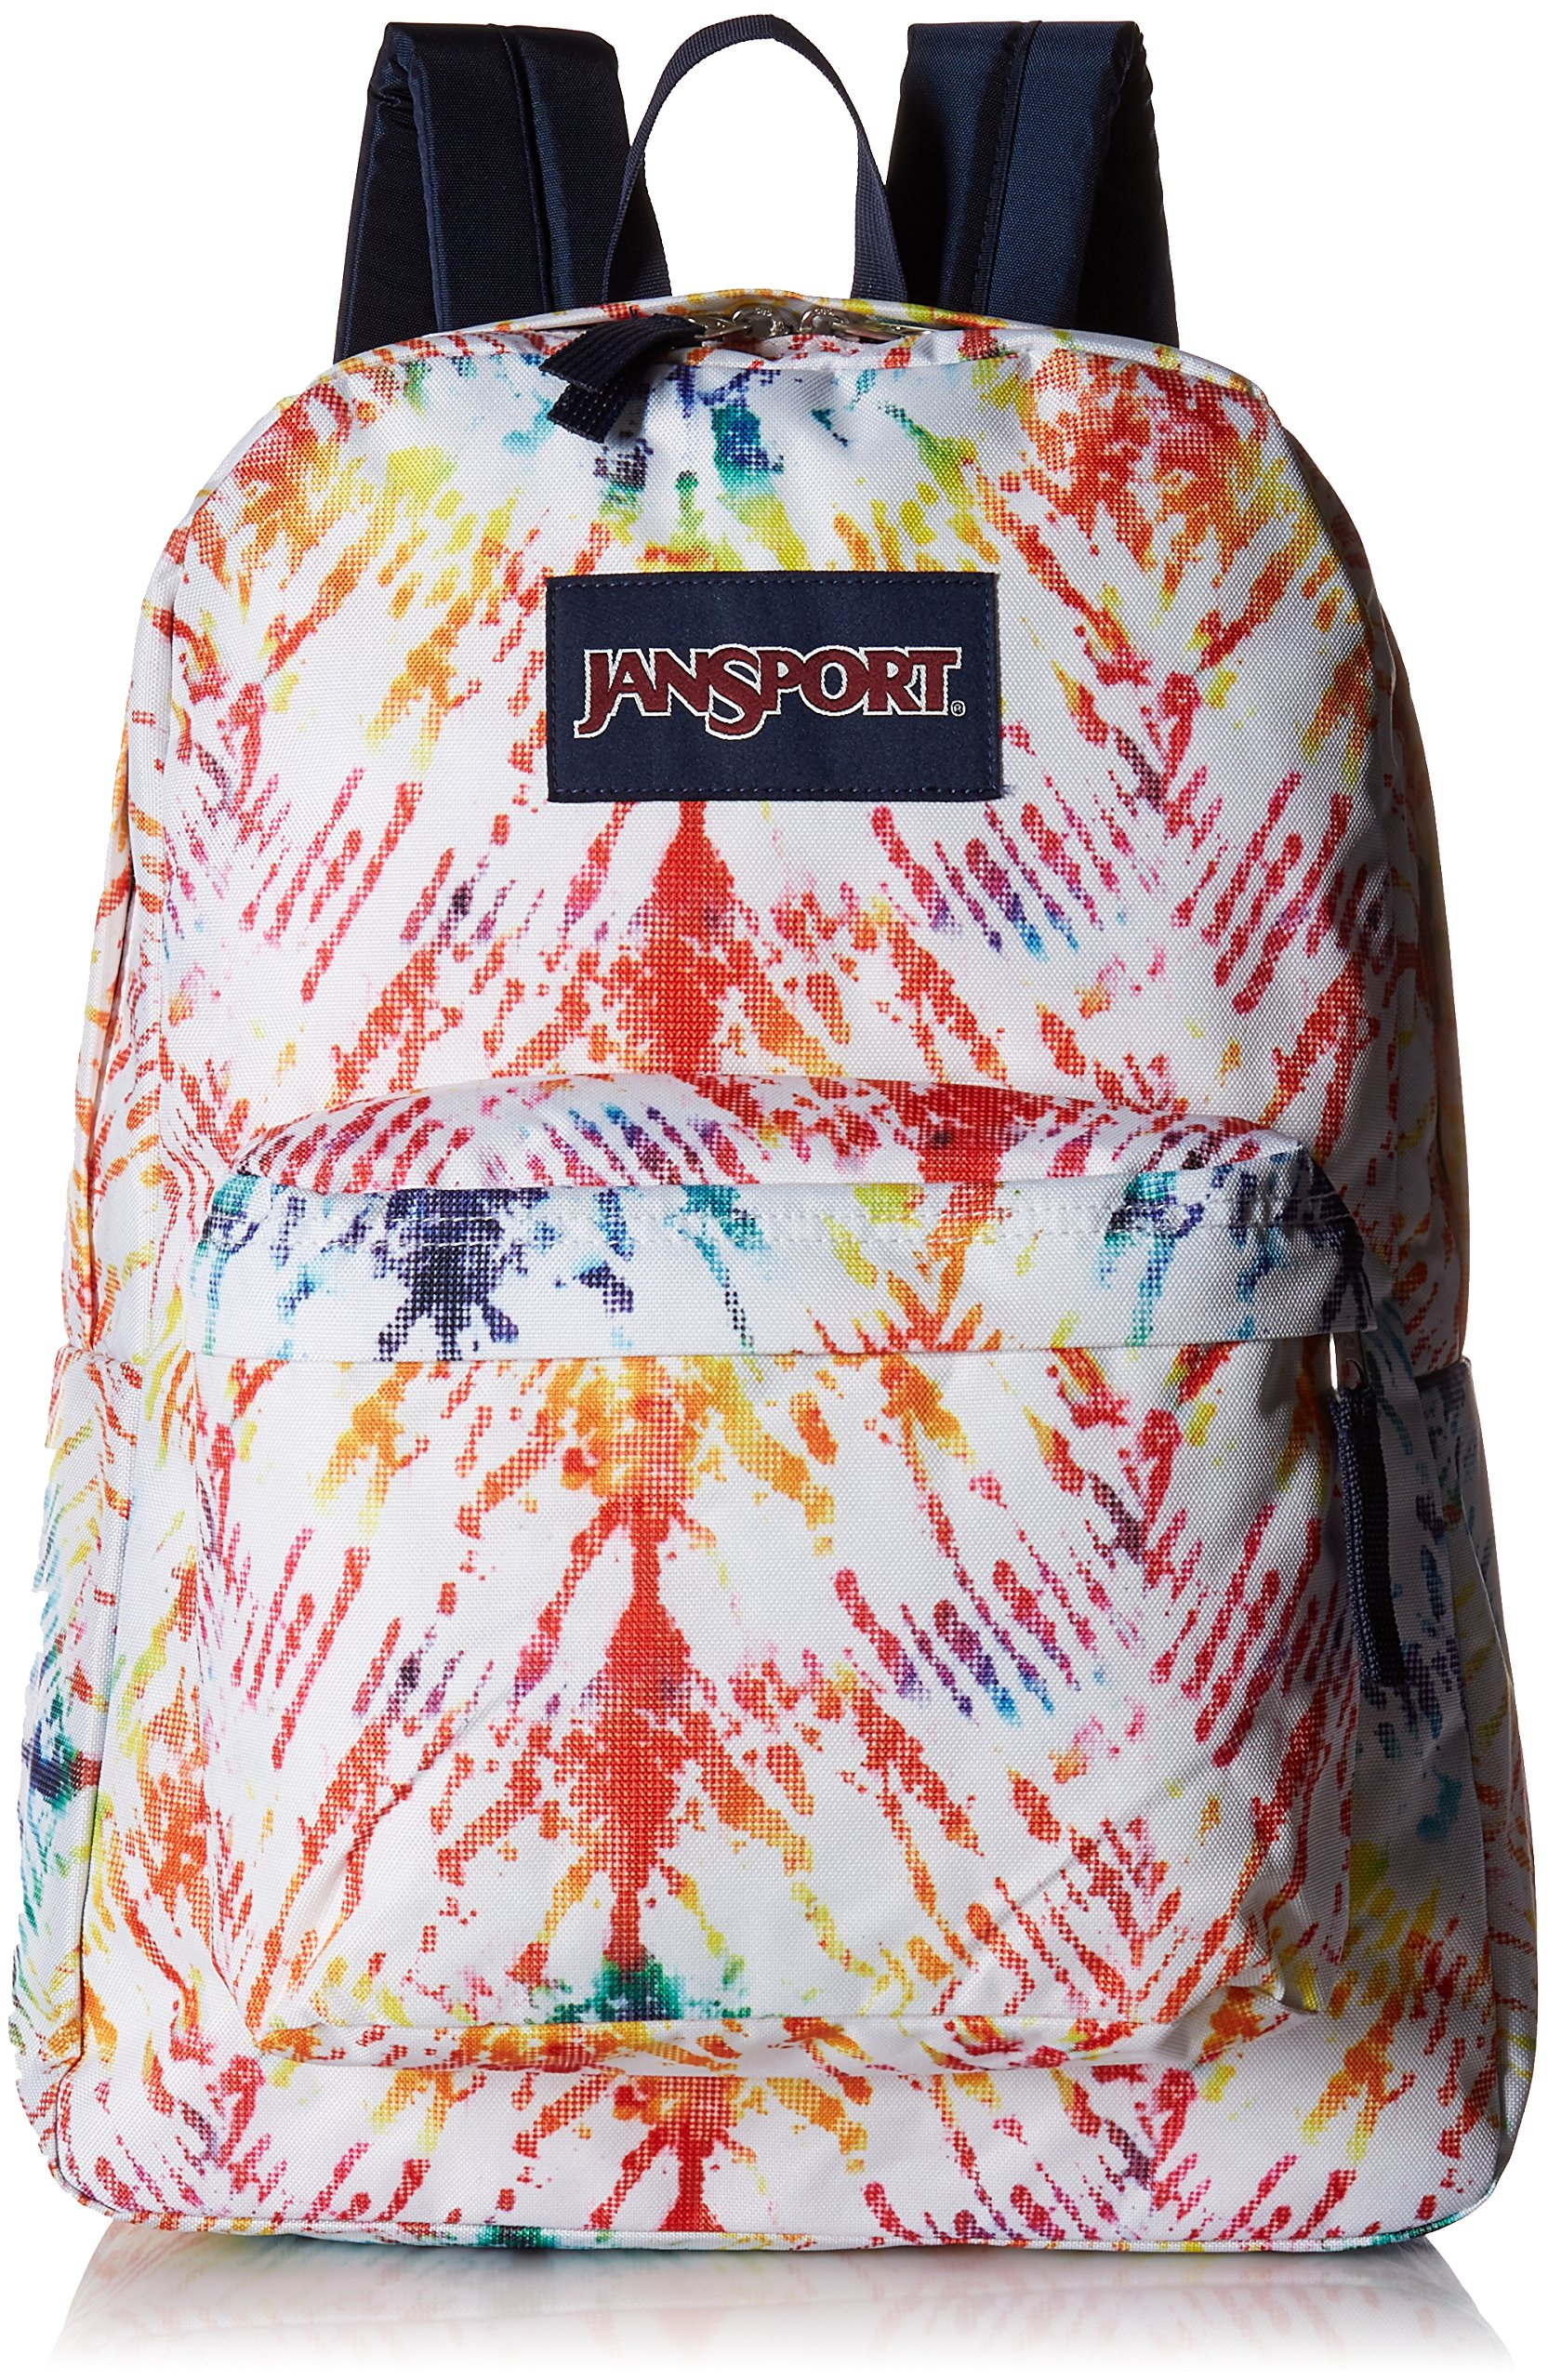 JanSport Unisex SuperBreak Rainbow Tie-Dye One Size by JanSport (Image #1)